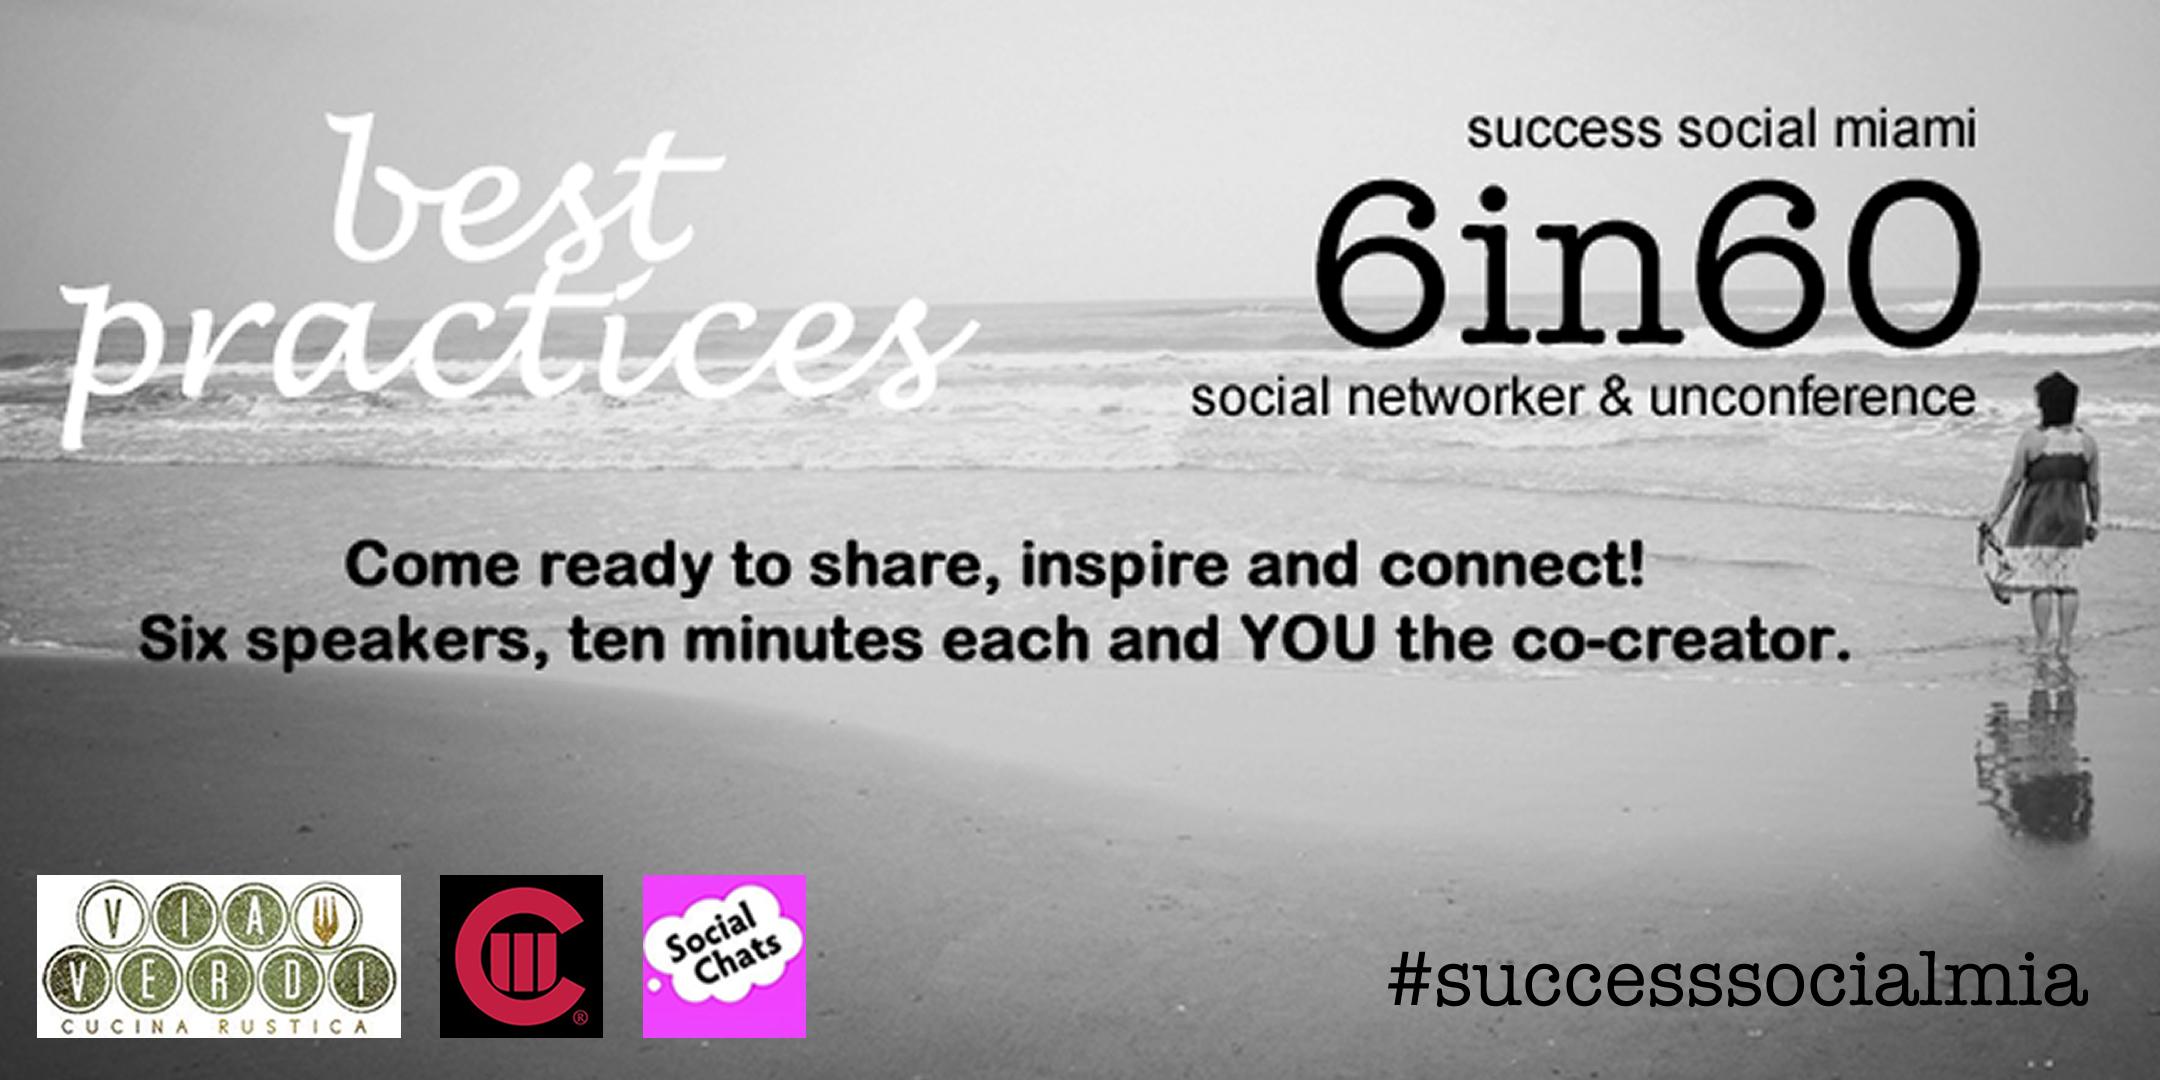 social success miami